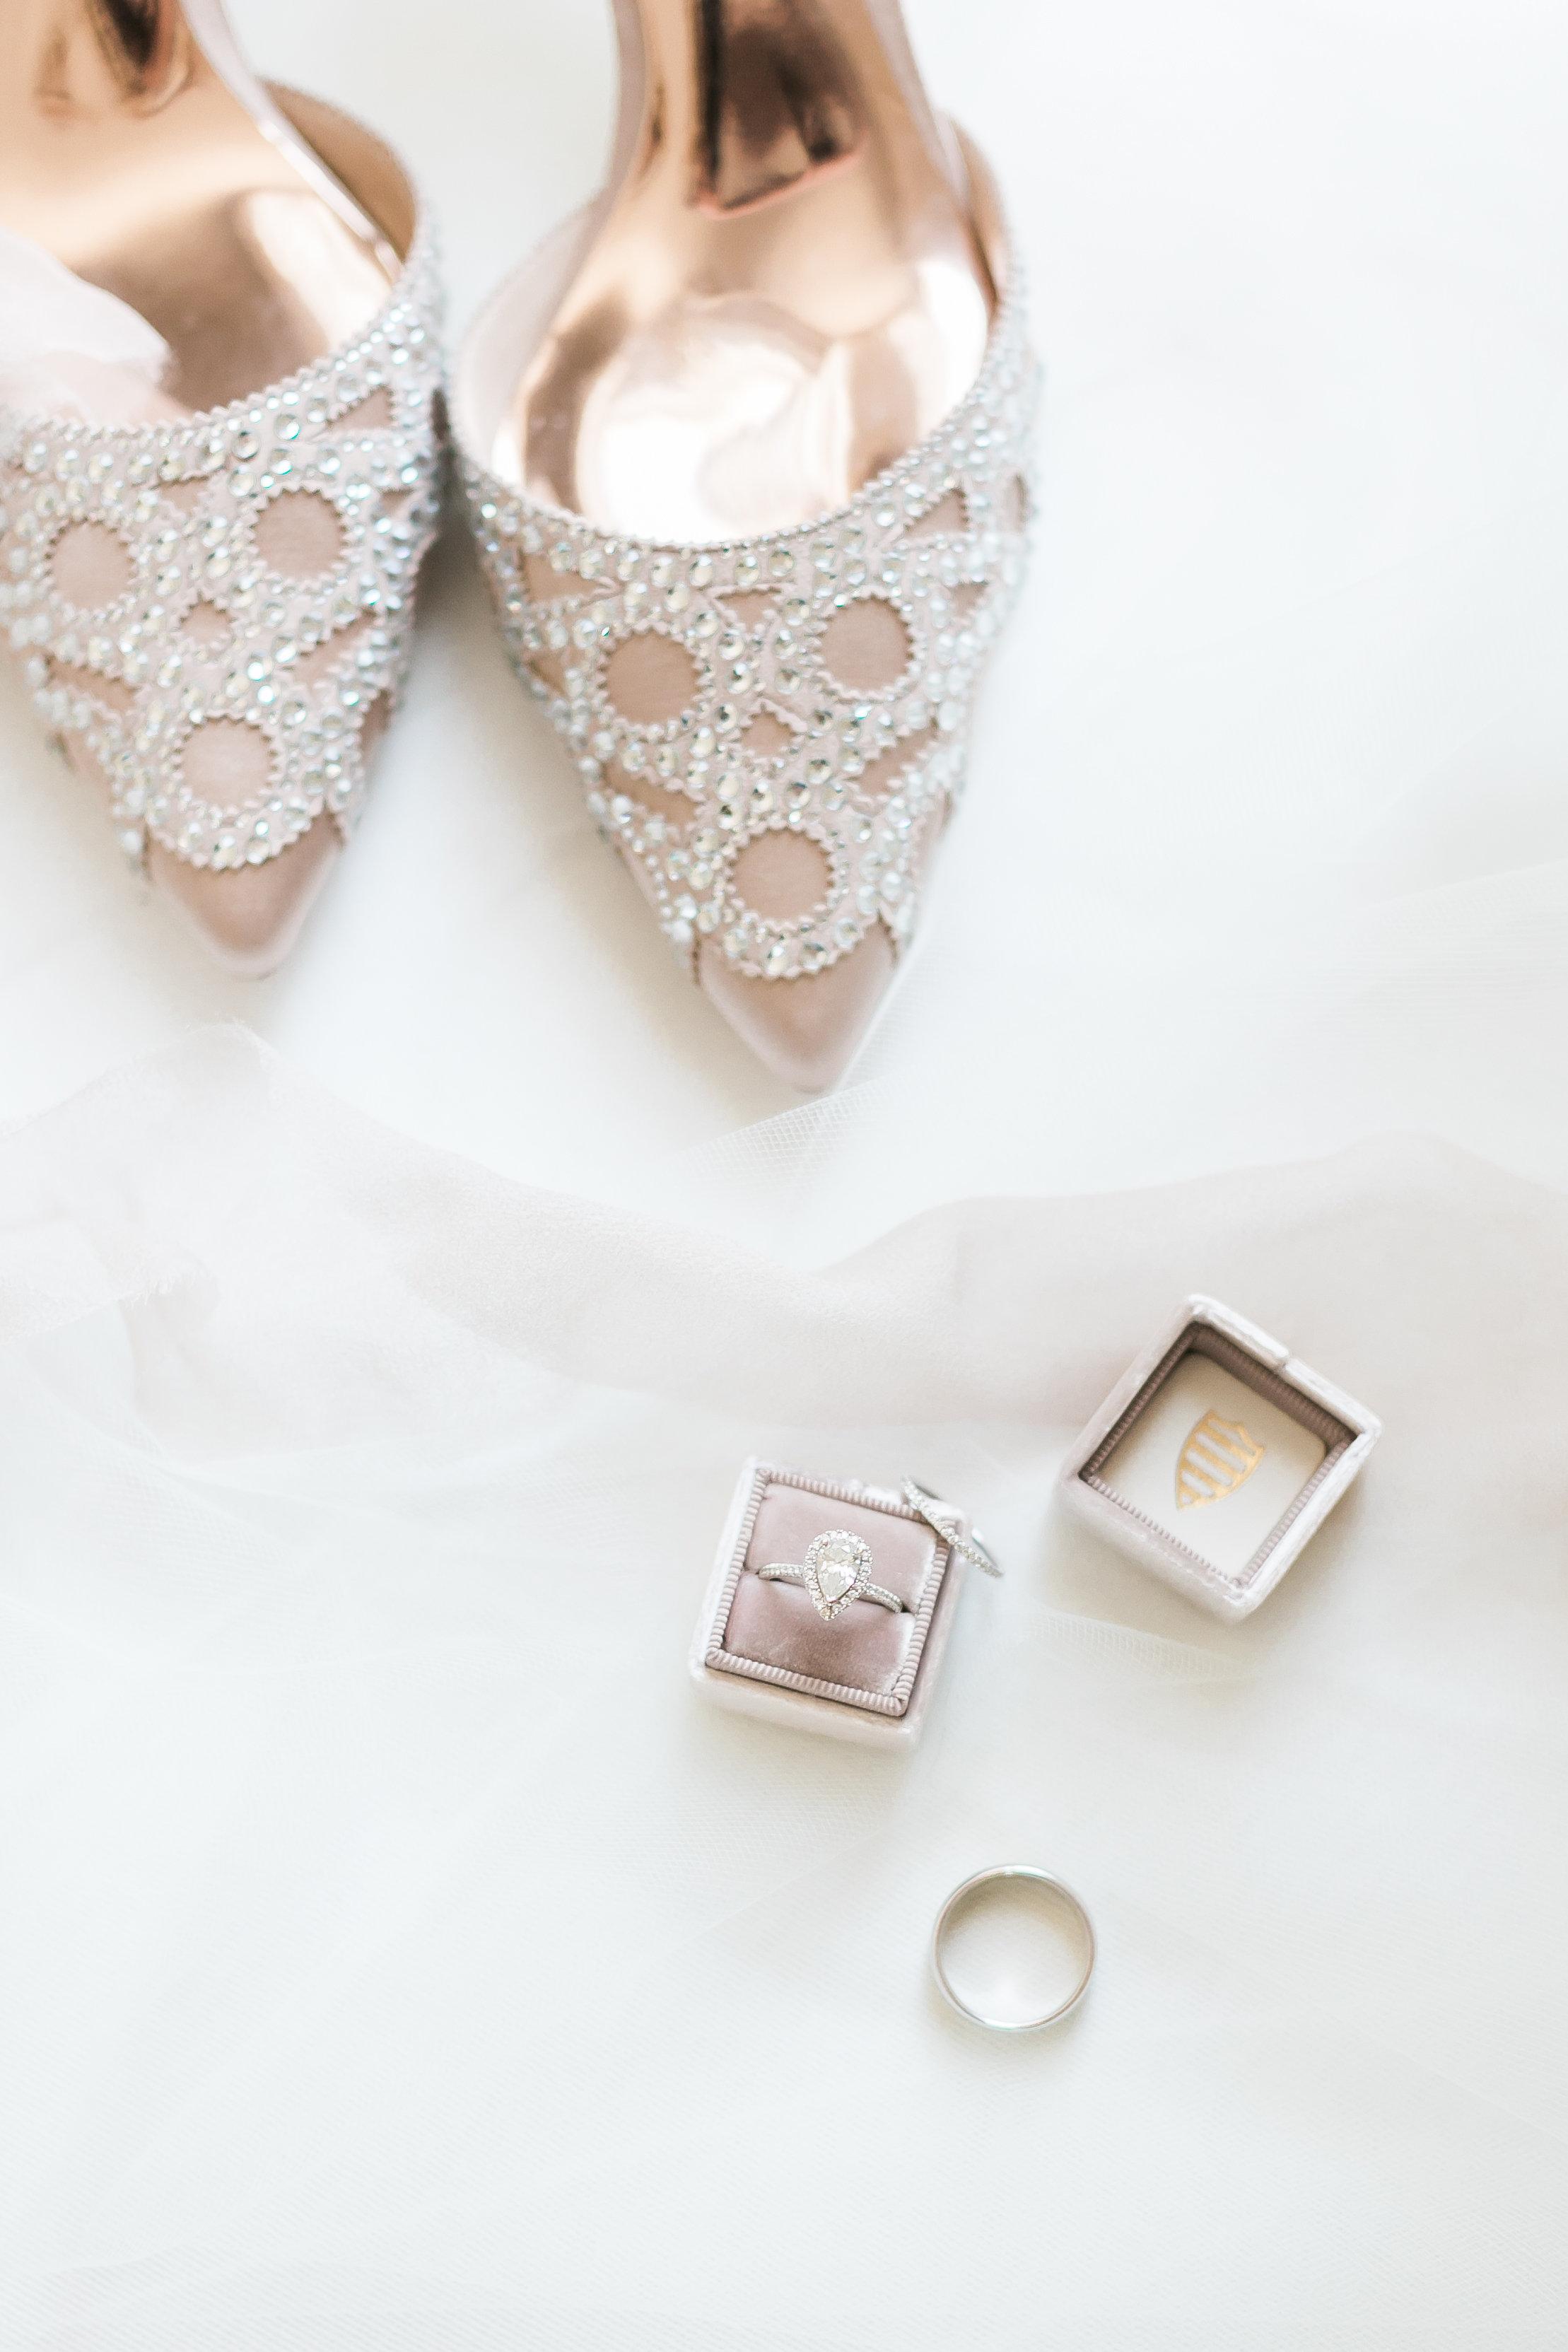 badgley mischka shoes wedding shoes las vegas wedding planner